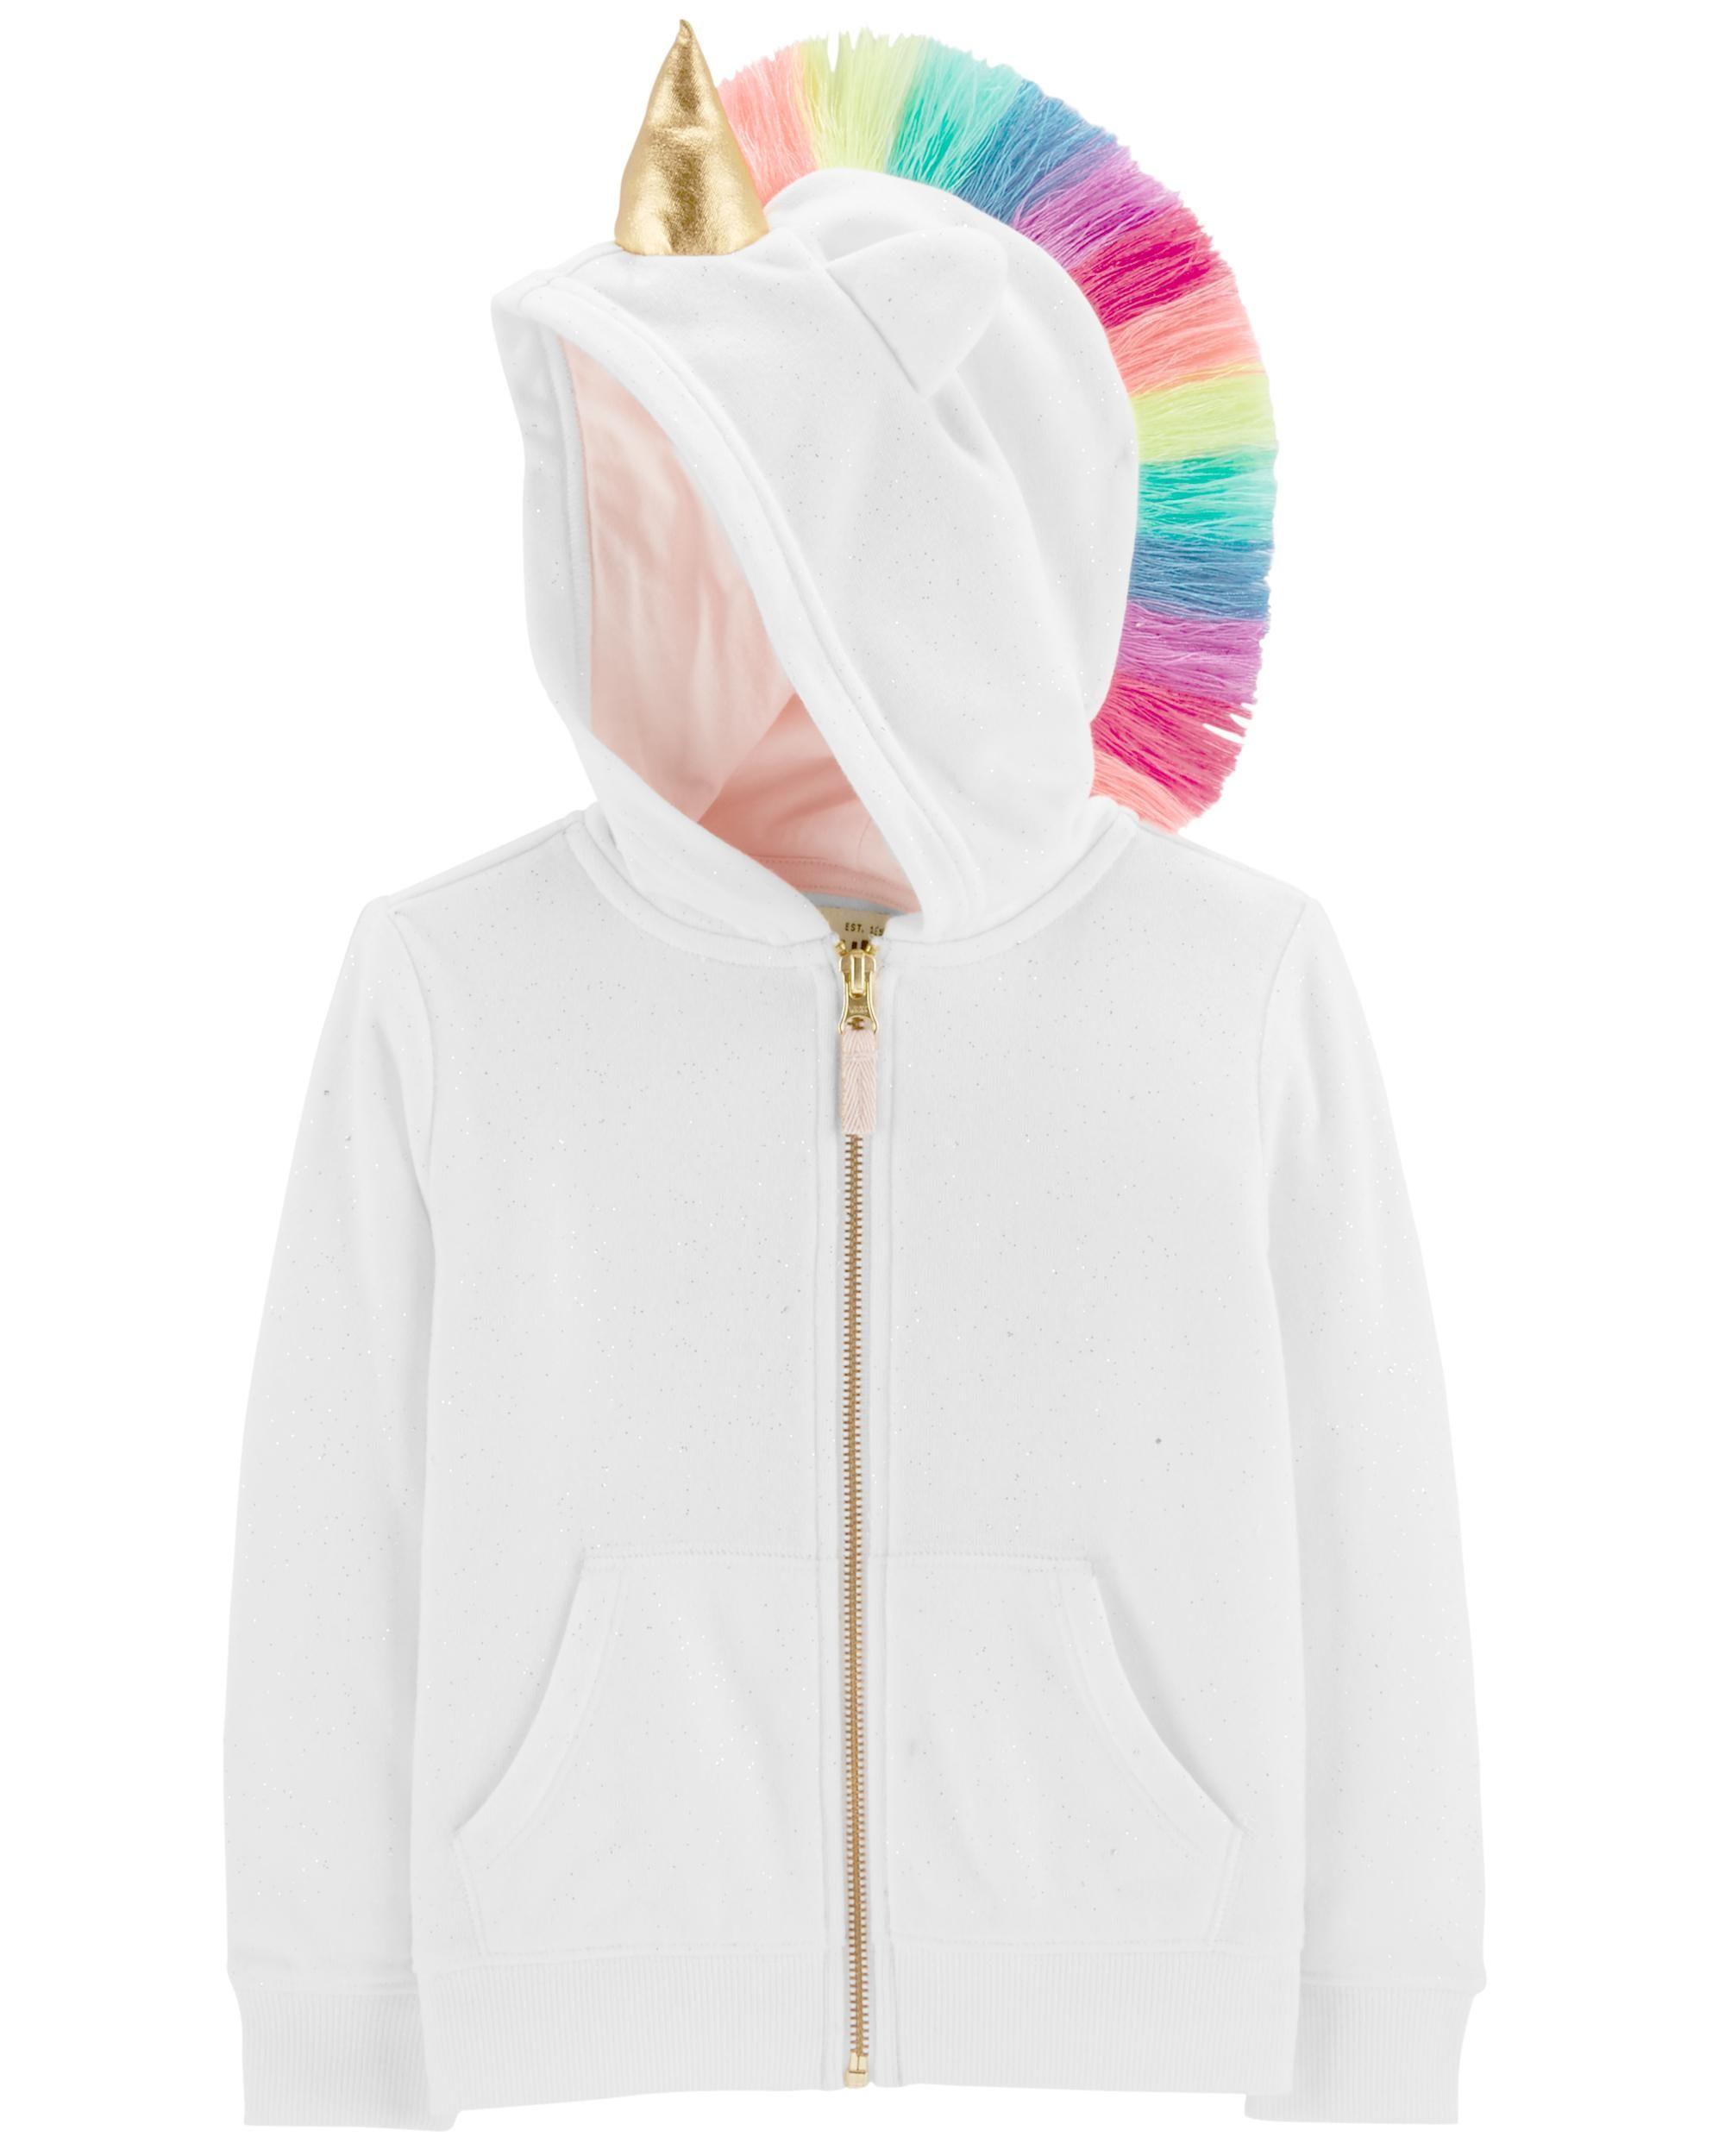 fbb3198a3 Unicorn Glitter Hoodie in 2019